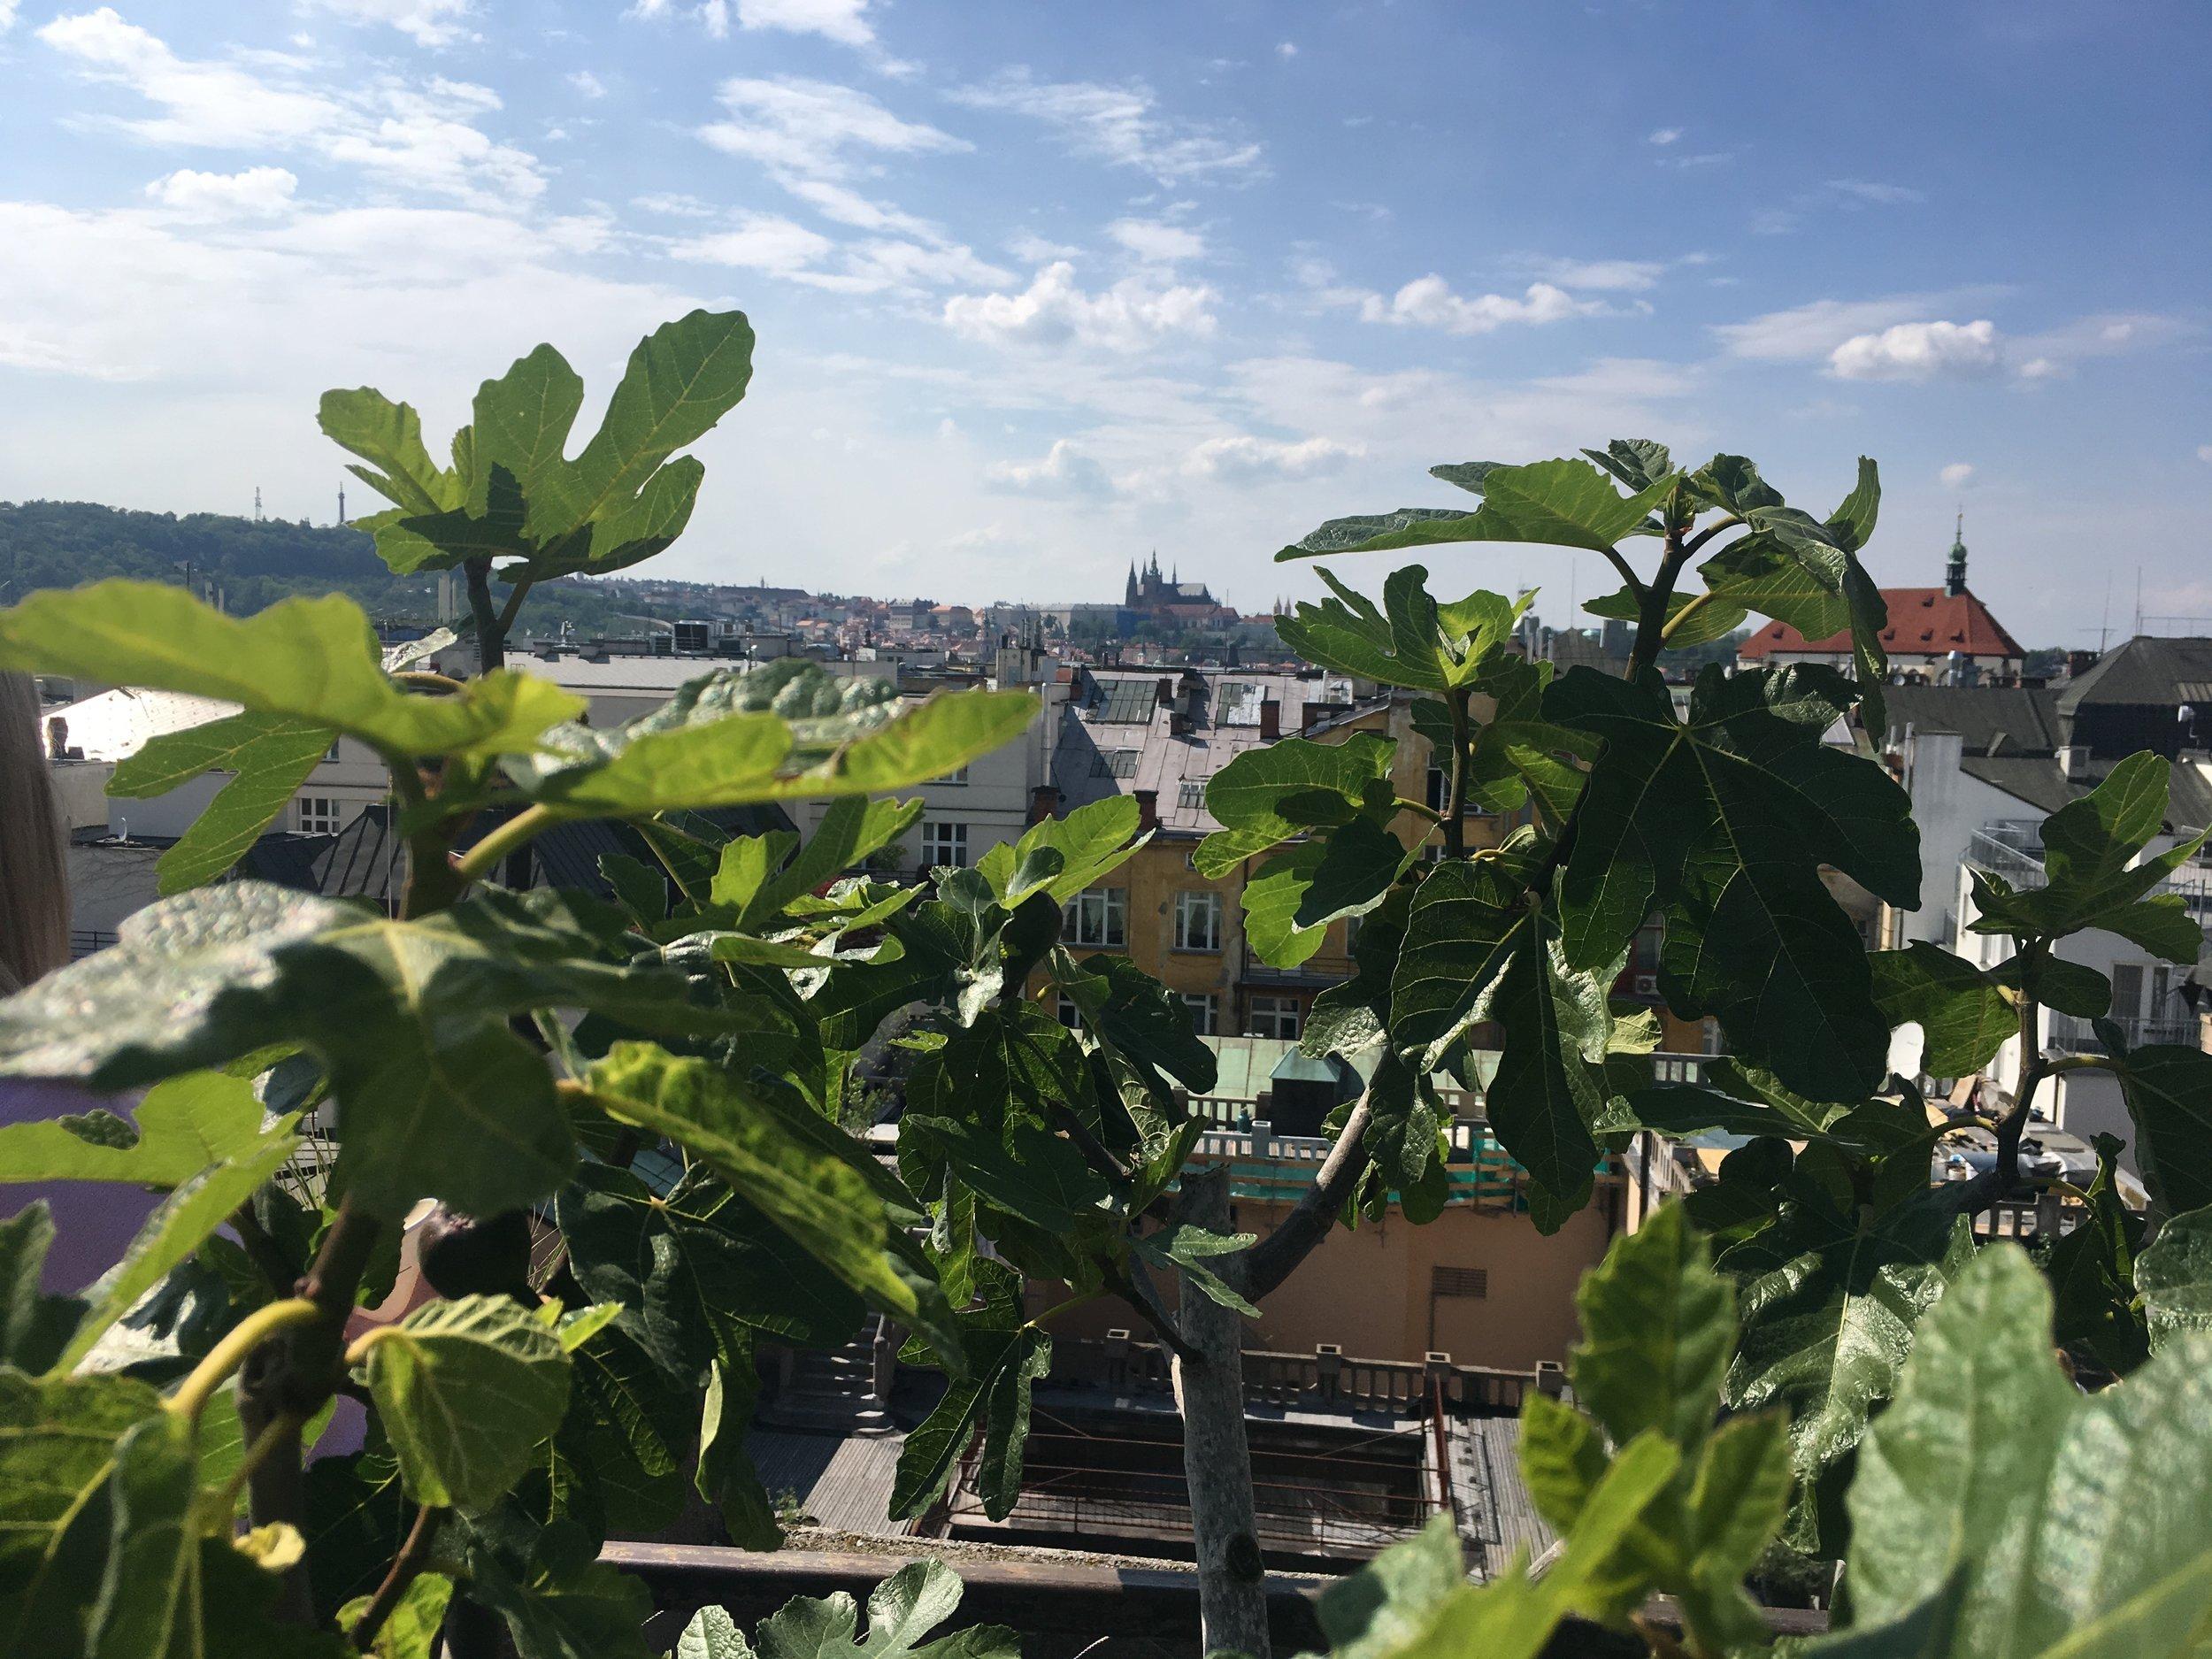 Haenke_Rooftop_UrbanBotanics